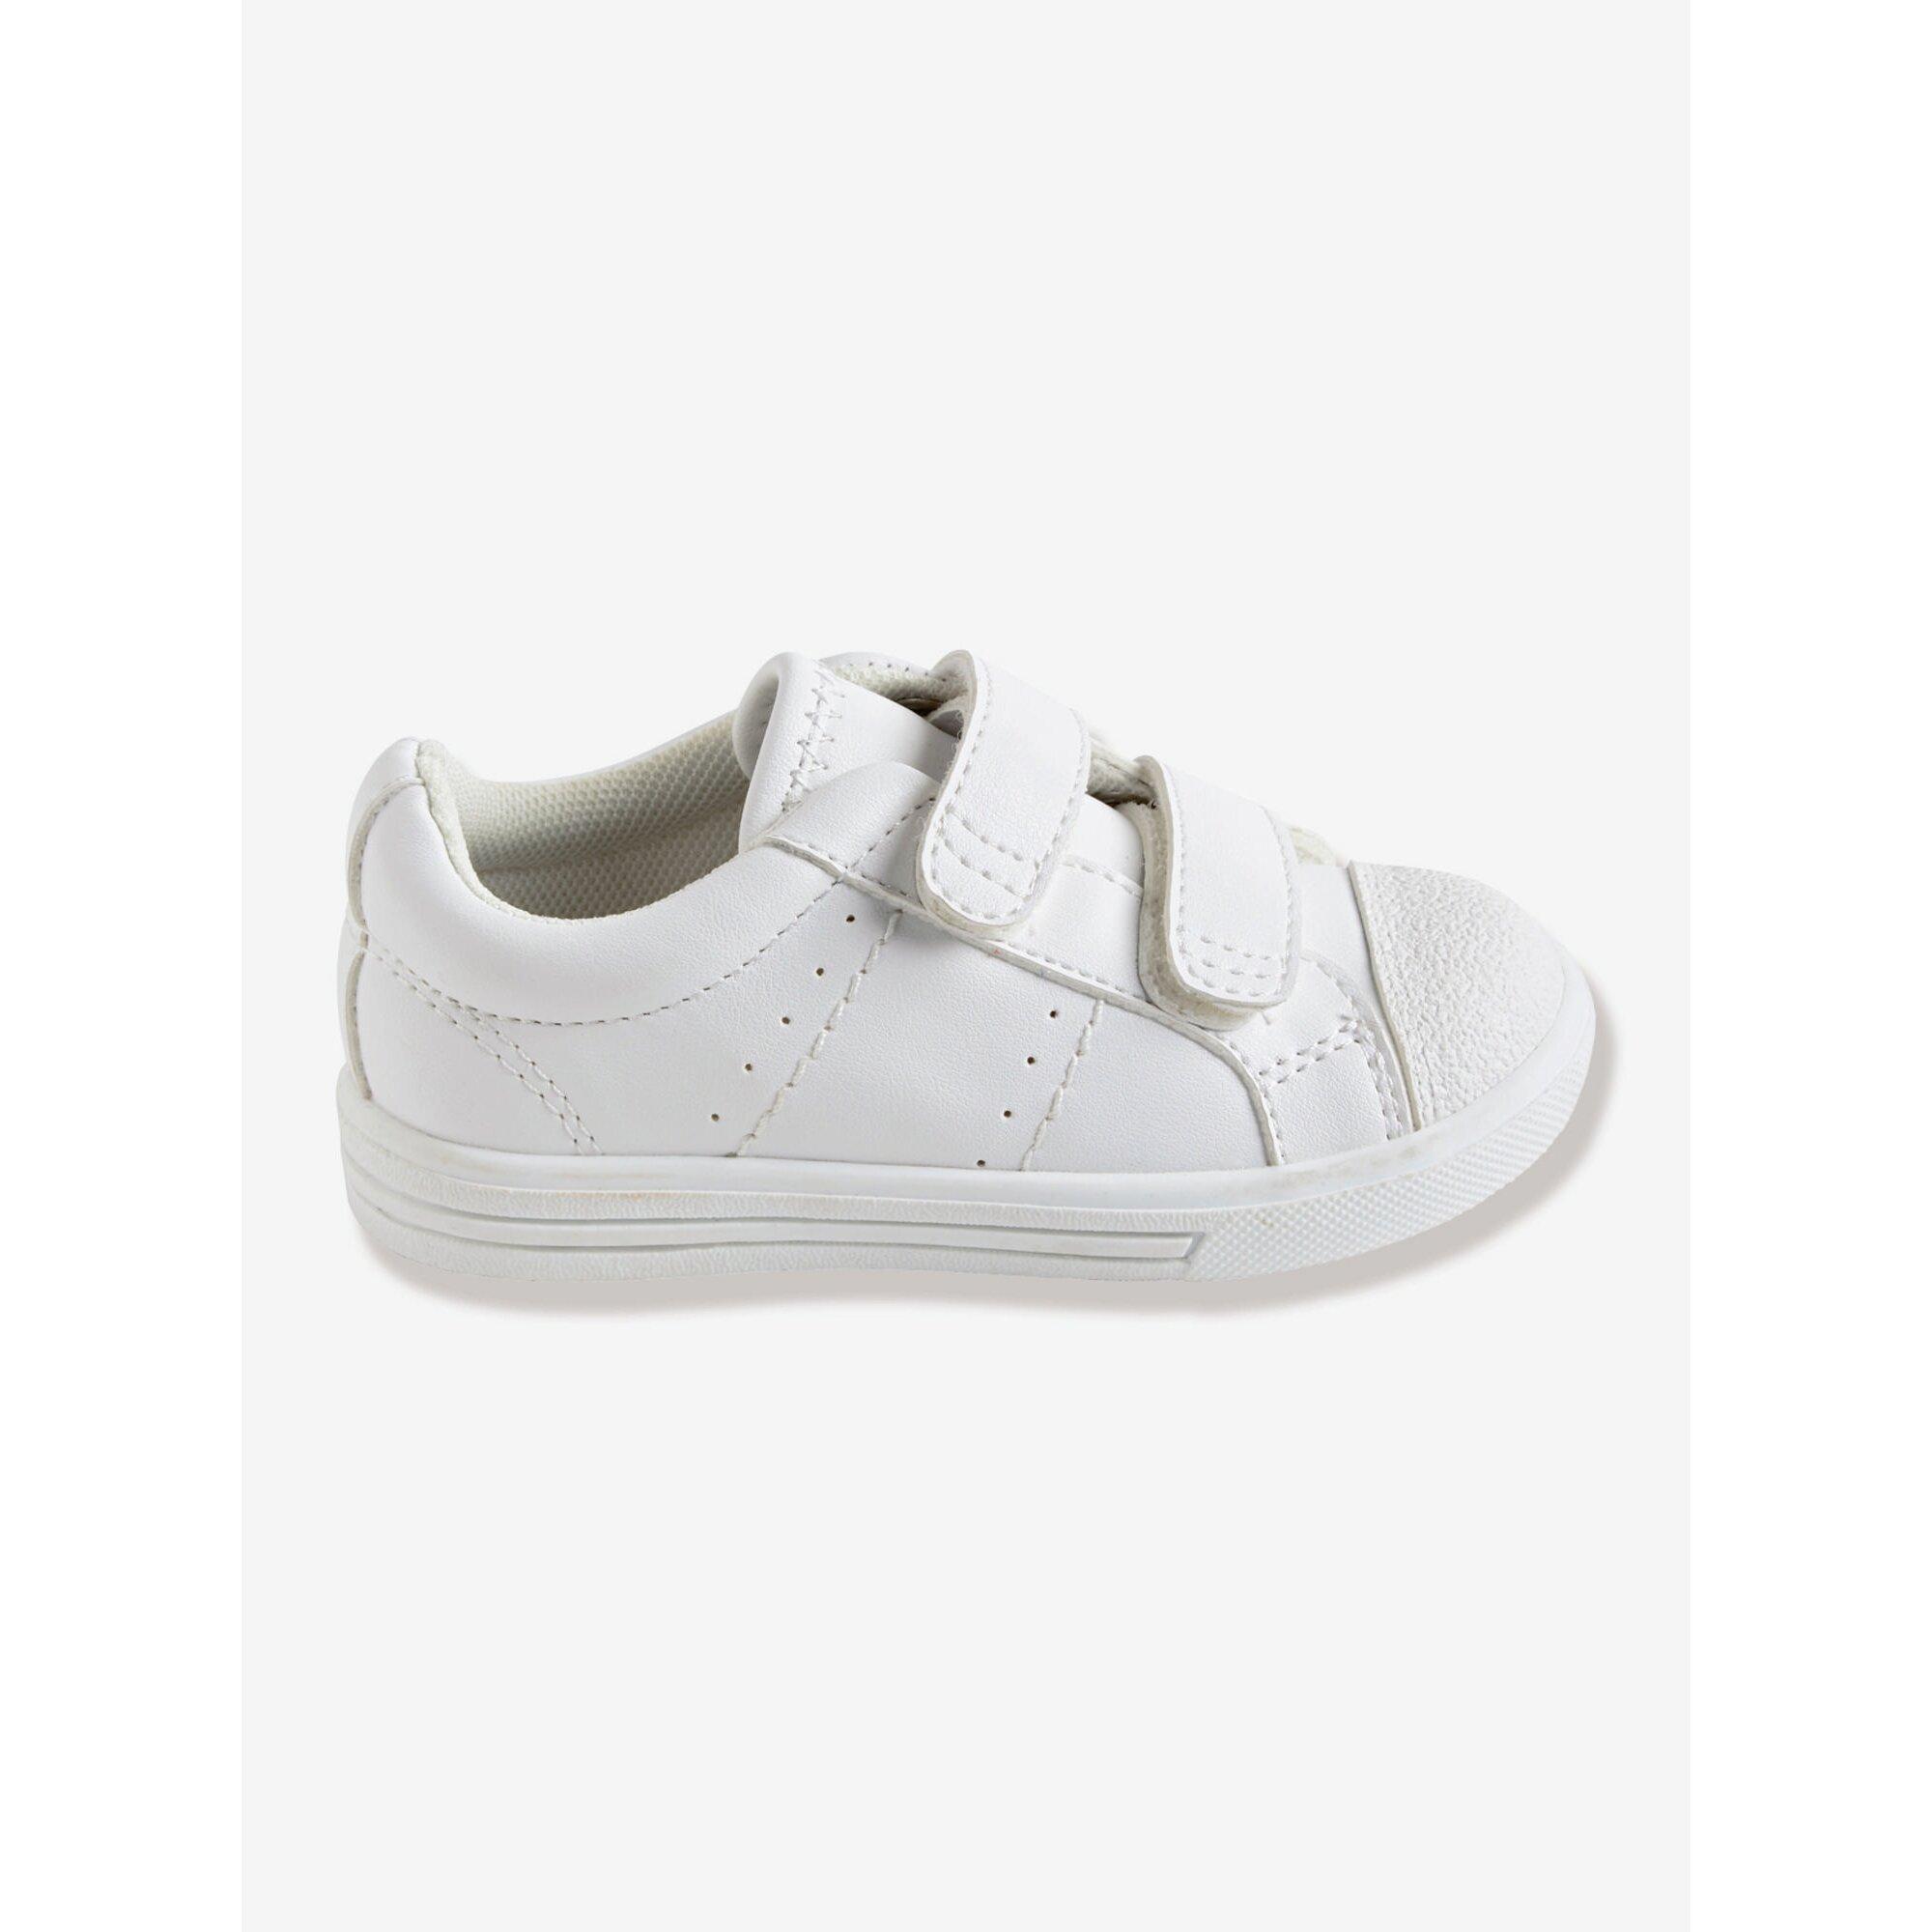 vertbaudet-sneakers-mit-klettverschluss, 25.99 EUR @ babywalz-de